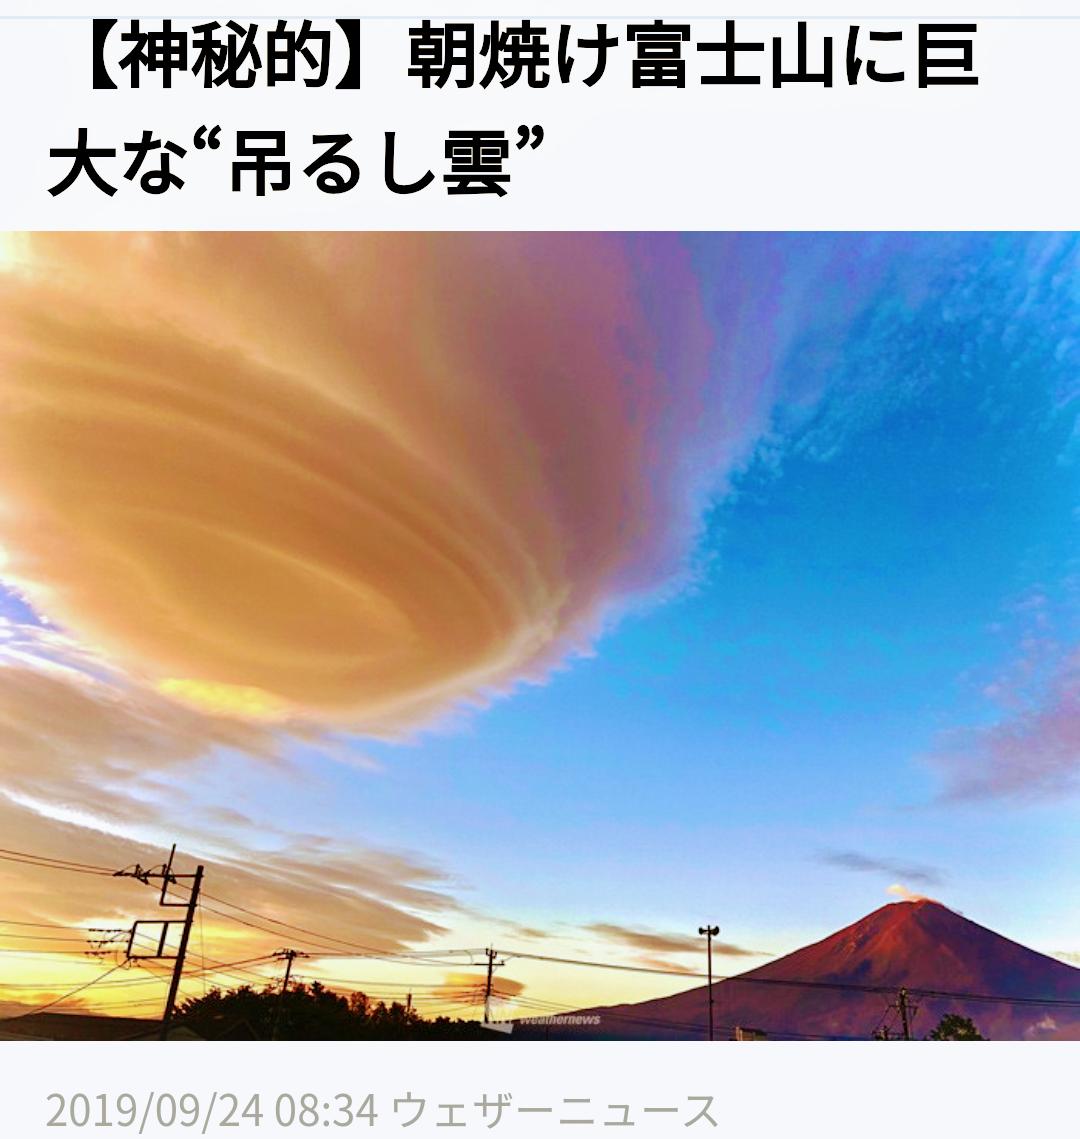 f:id:ekikyorongo:20191012091657p:plain